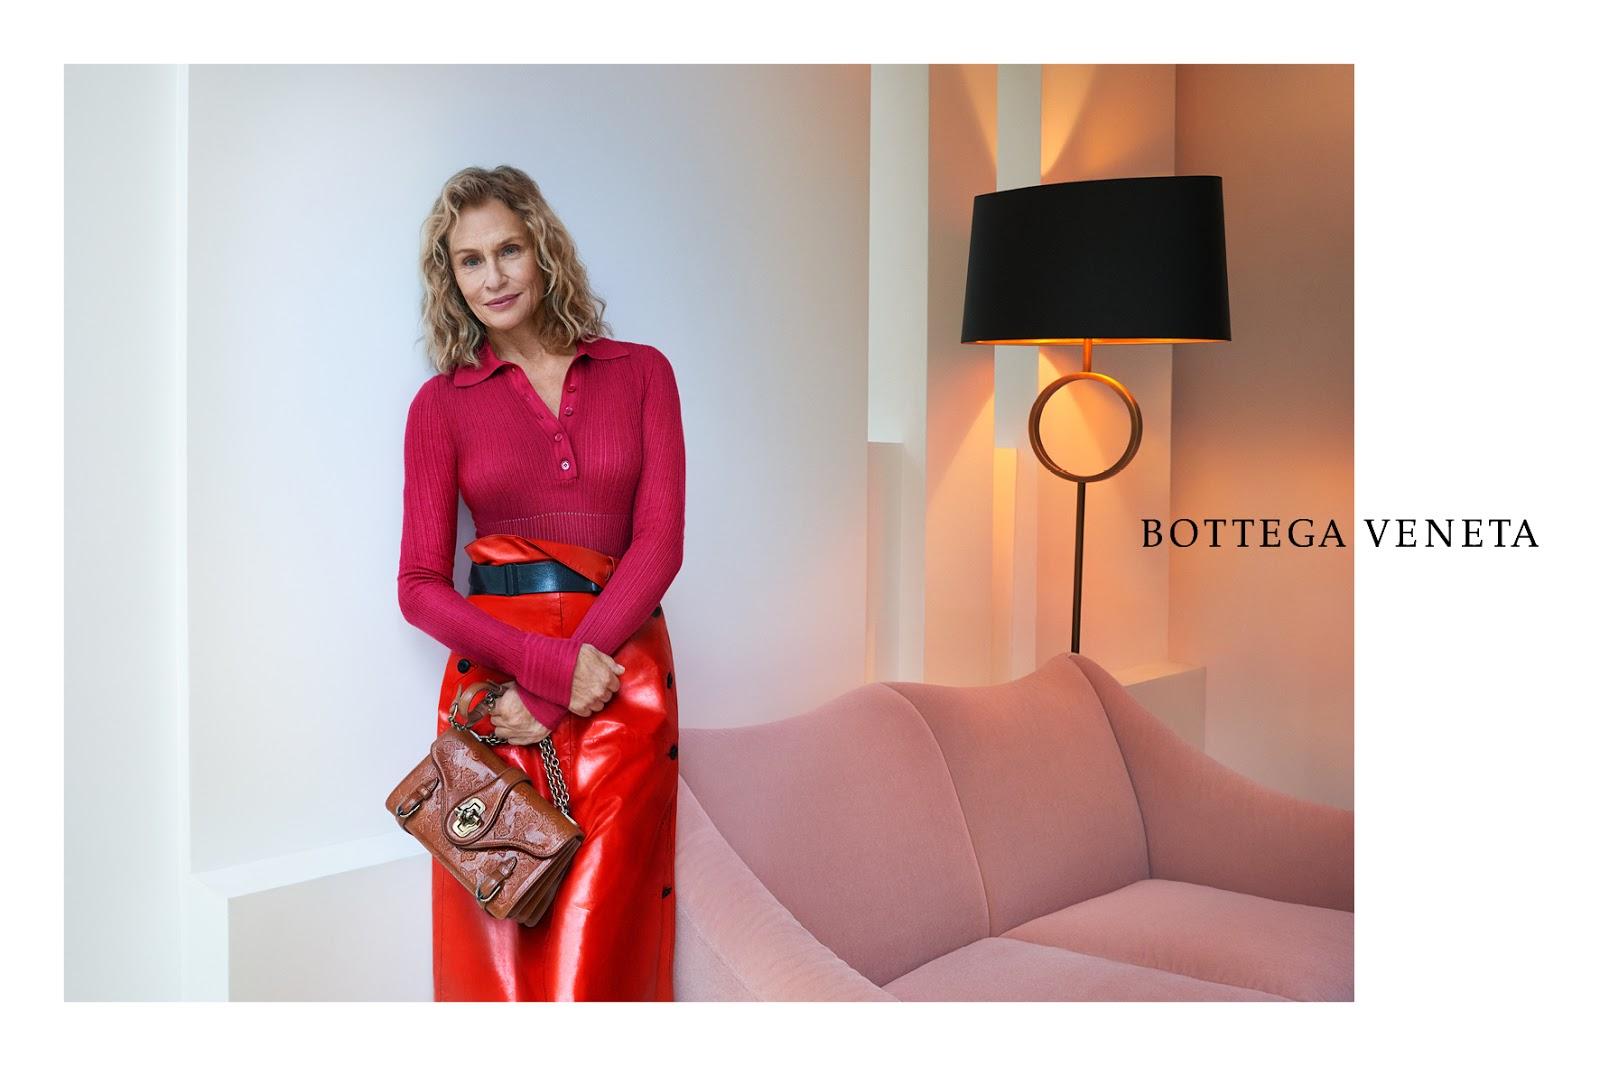 Bottega Veneta's Spring/Summer 2017 AOC Ad Campaign and BTS